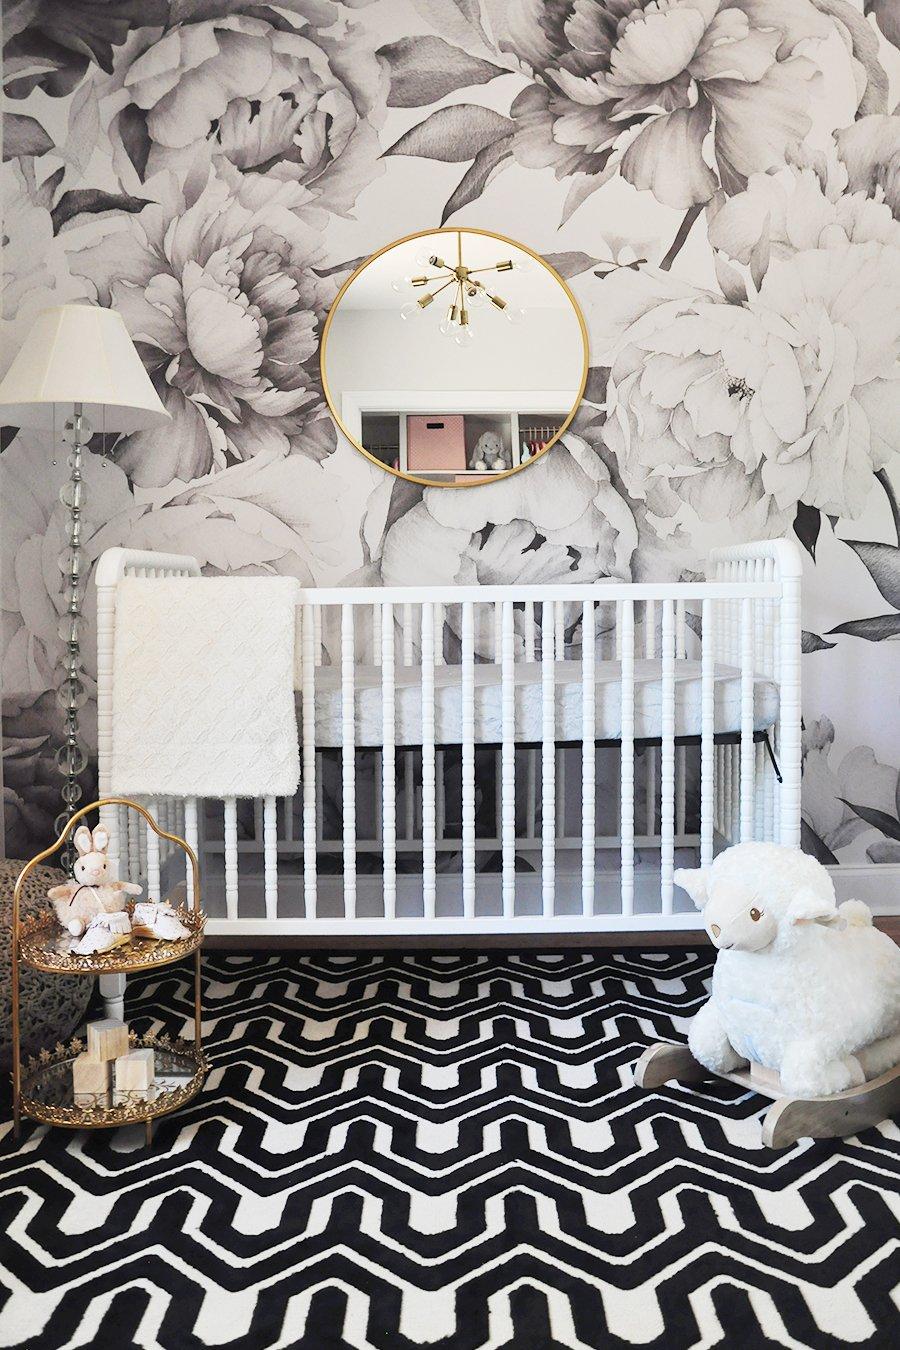 Black and white nursery design by Foxy Oxie